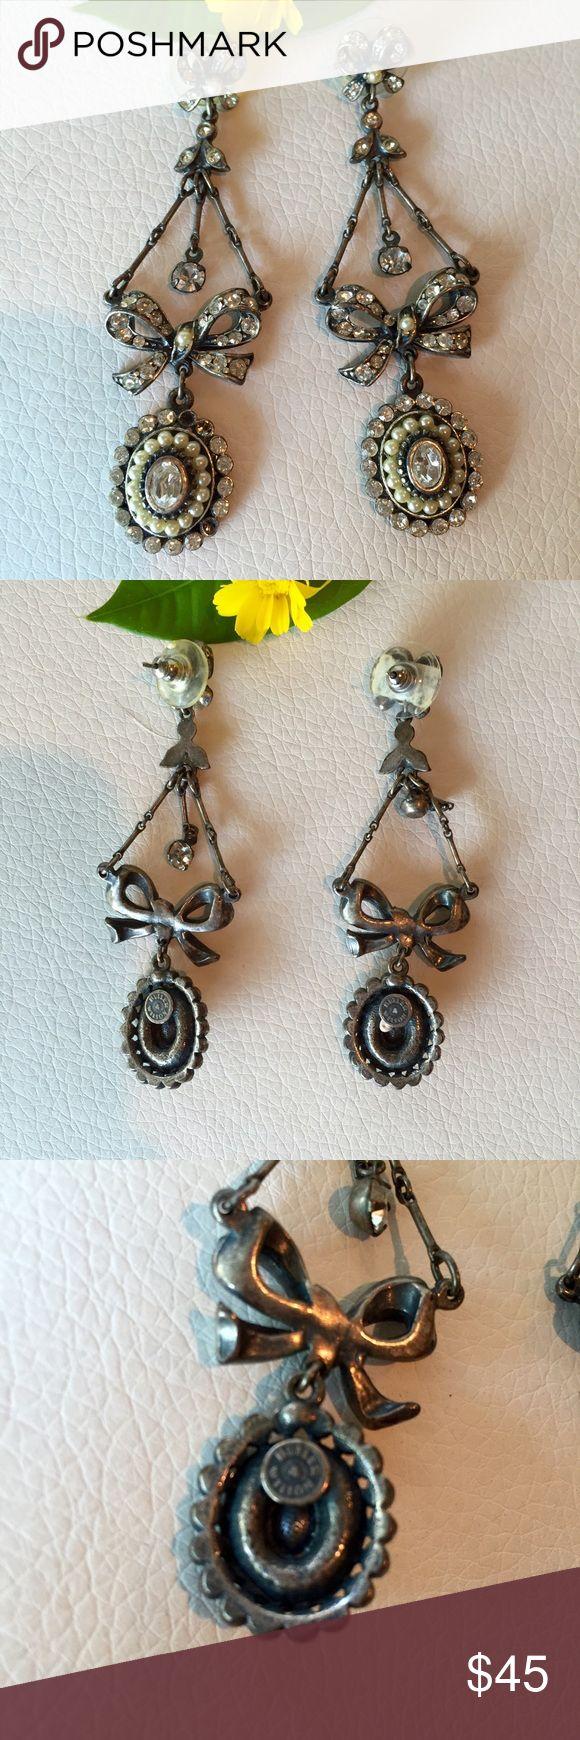 Butler & Wilson Uk Diamanté Chandelier Earrings Butler & Wilson Uk Diamanté Chandelier  Earrings Sold